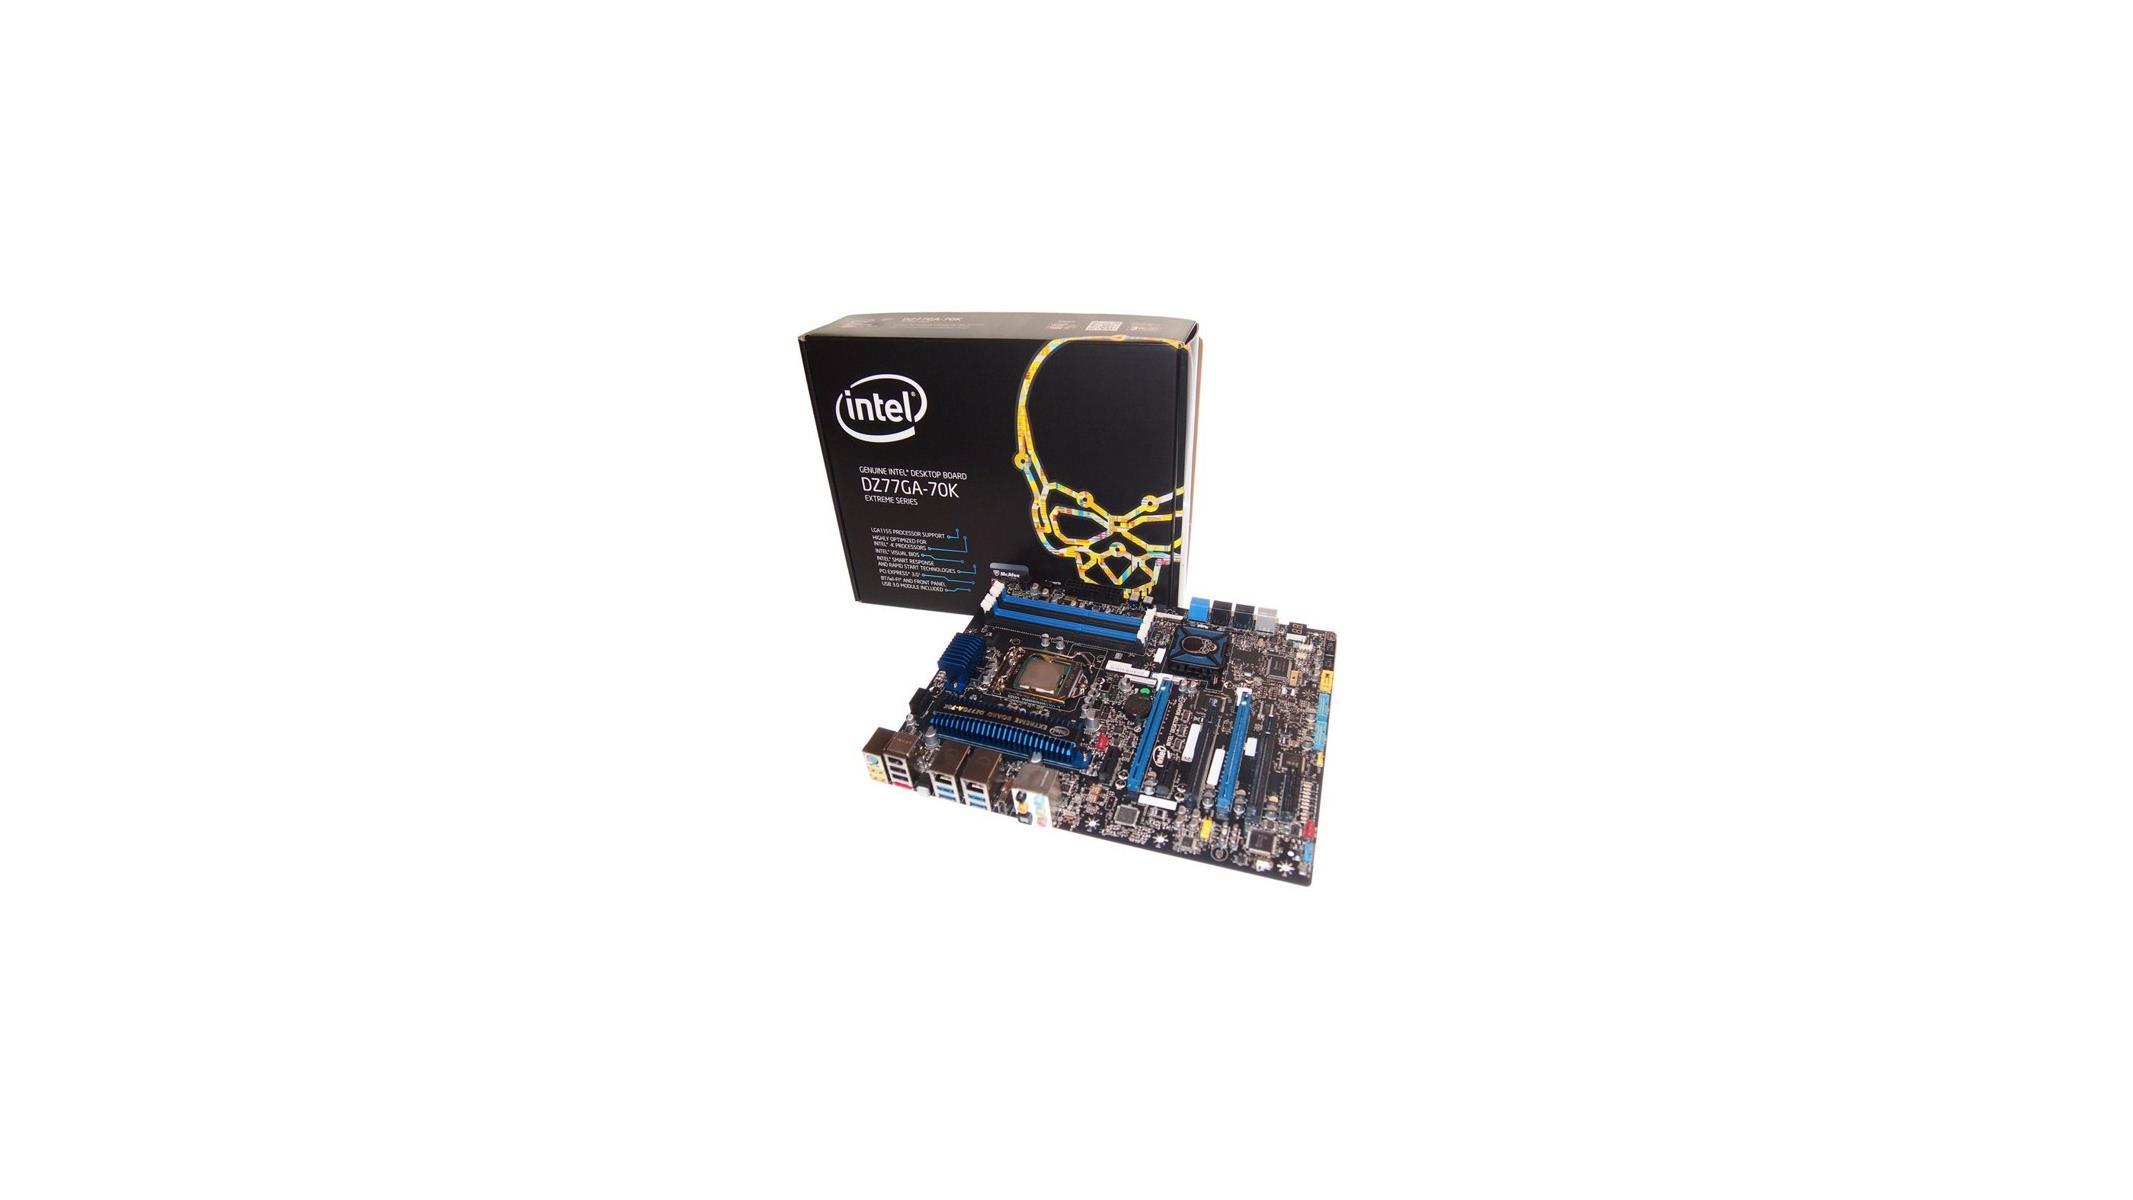 Z77 Motherboard Round-Up: MSI, ASUS, Gigabyte, Intel